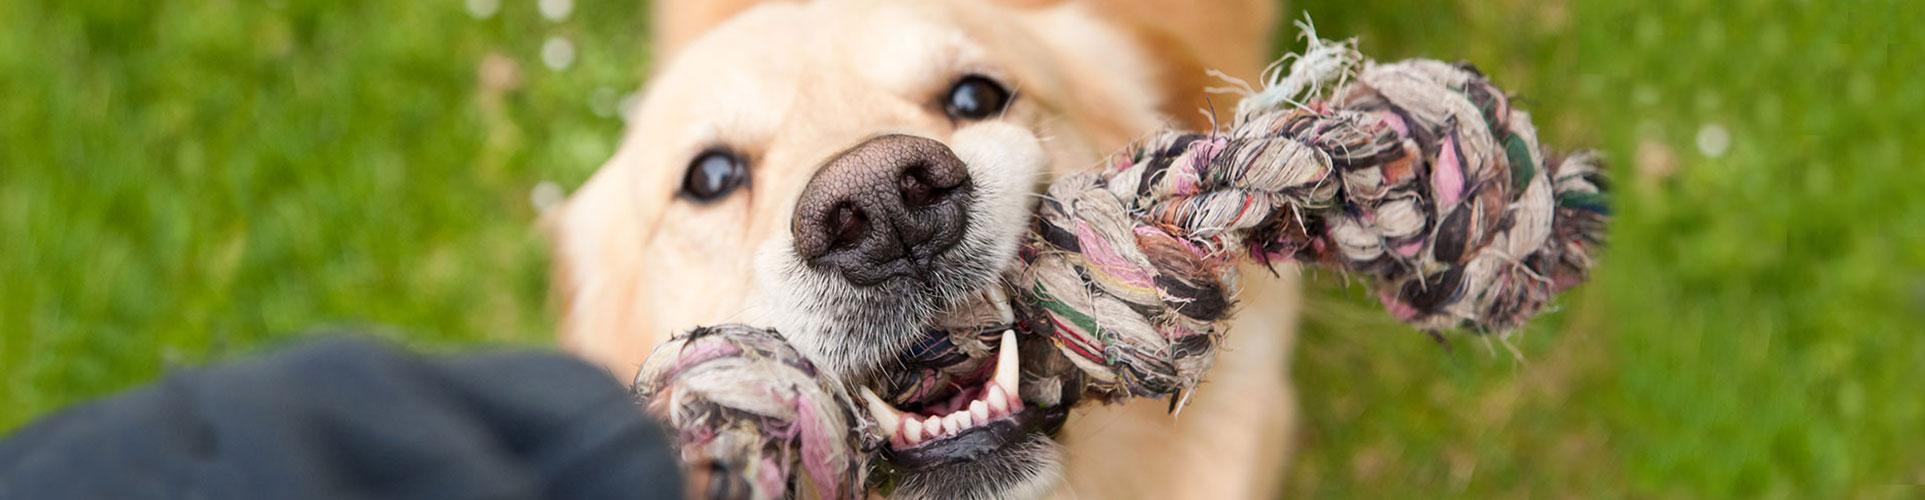 dog-tug-of-war